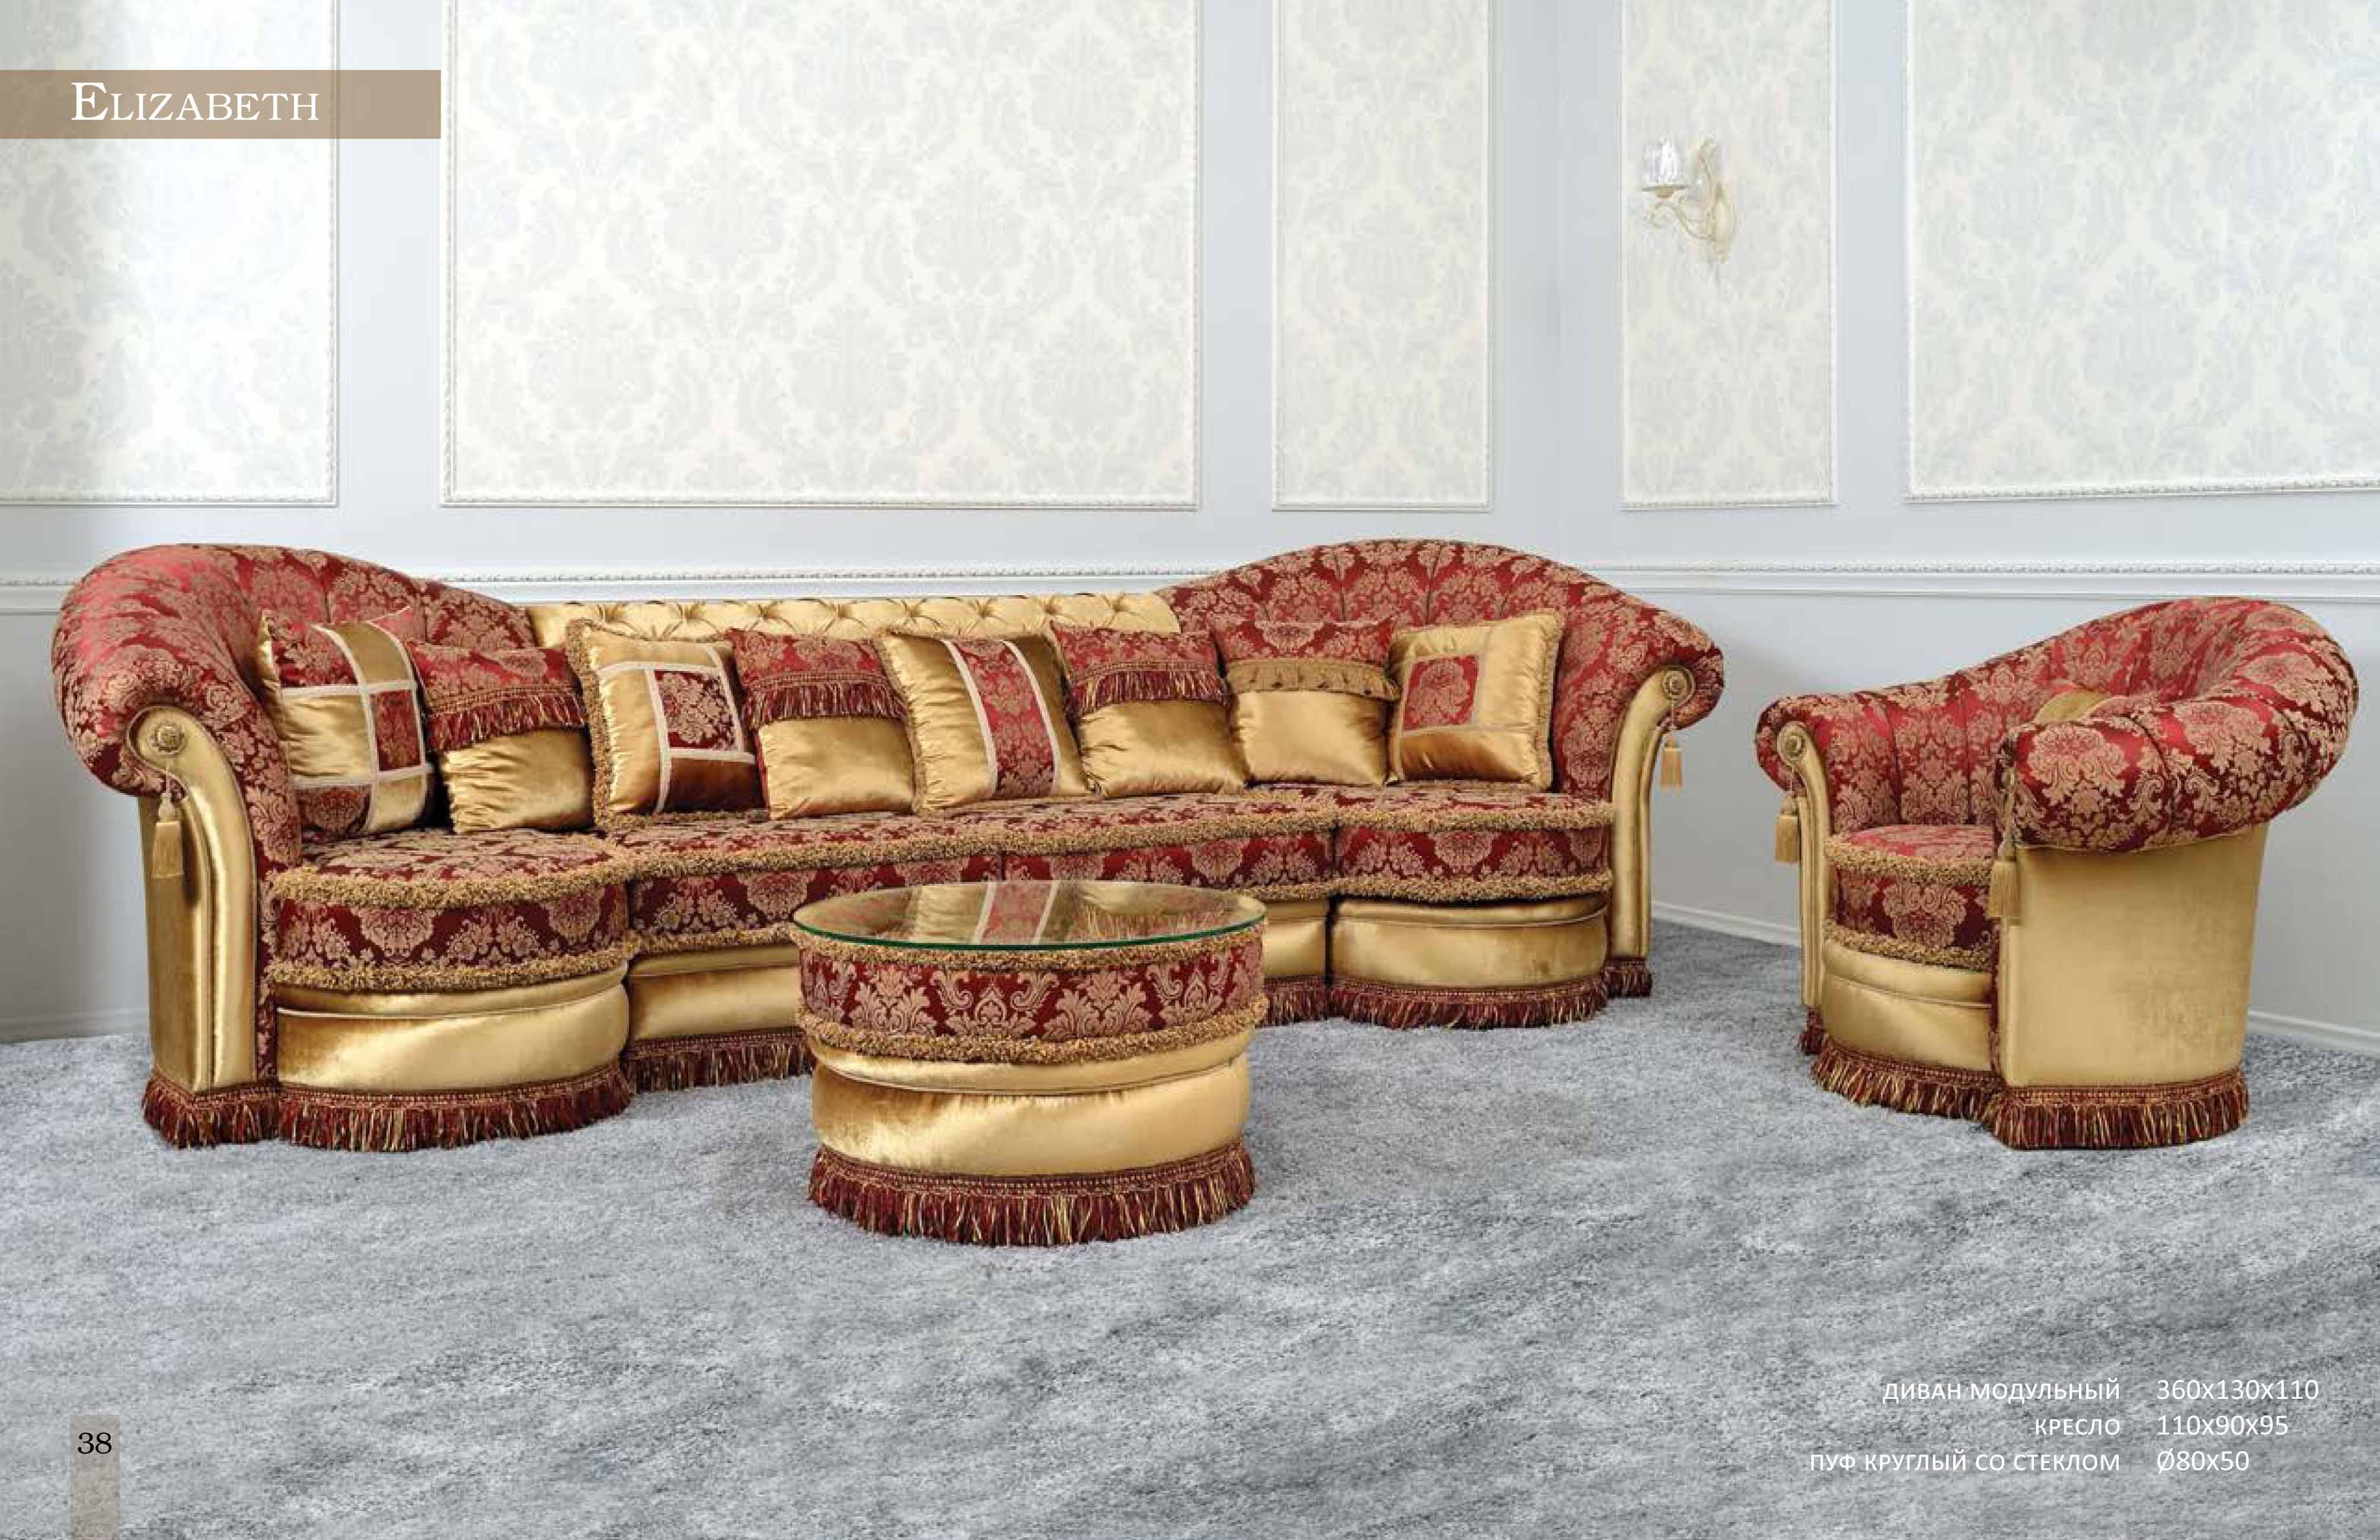 Мягкая мебель Elizabeth, фабрика Lux Mobili